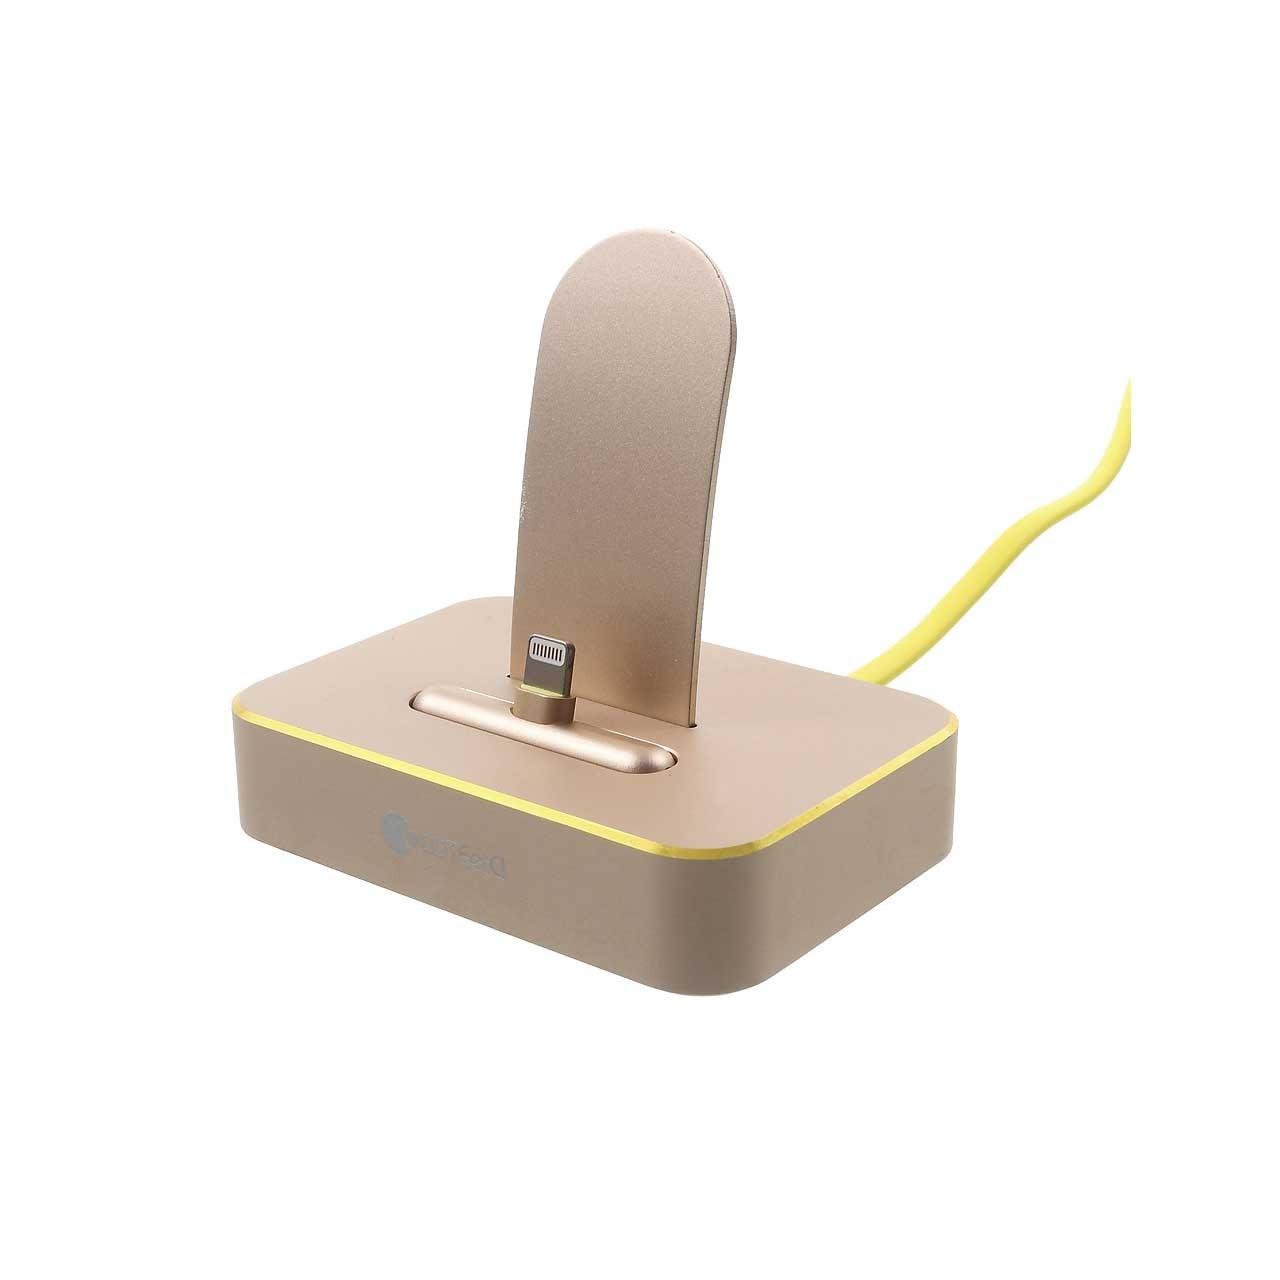 پایه شارژ لایتنینگ کوتتسی مدل Lightning Dock